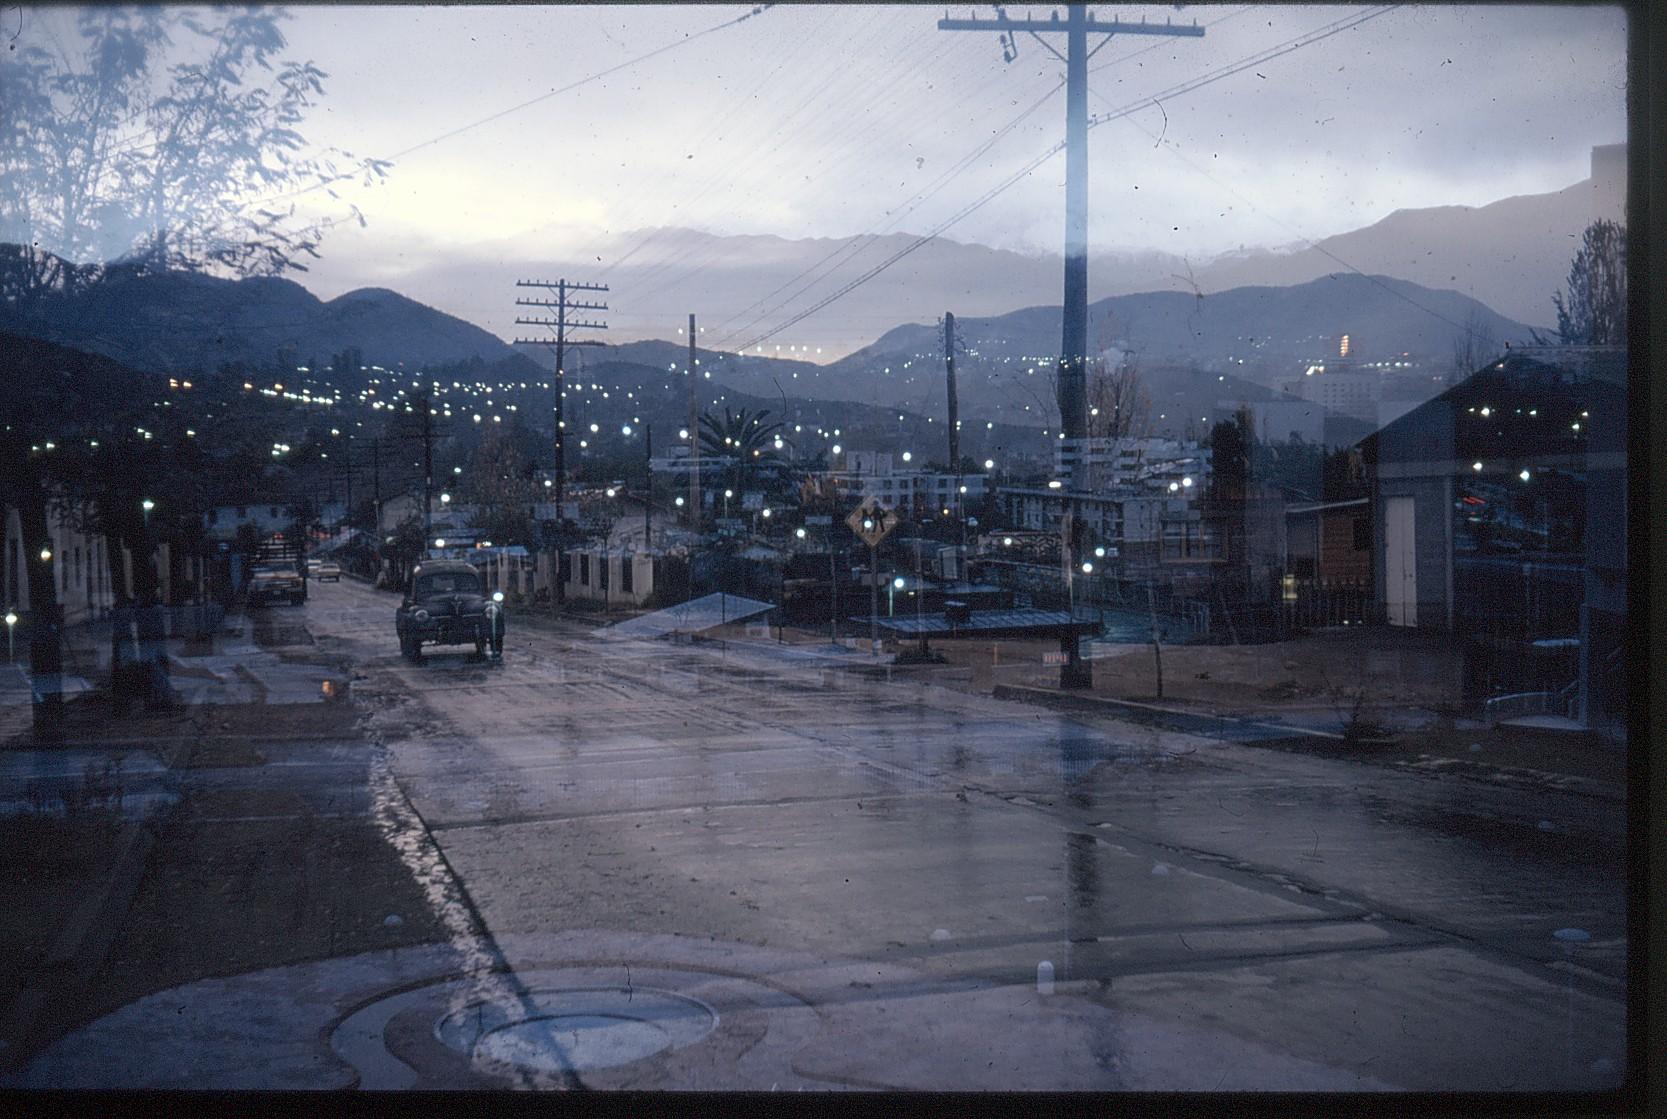 southamerica1972-5